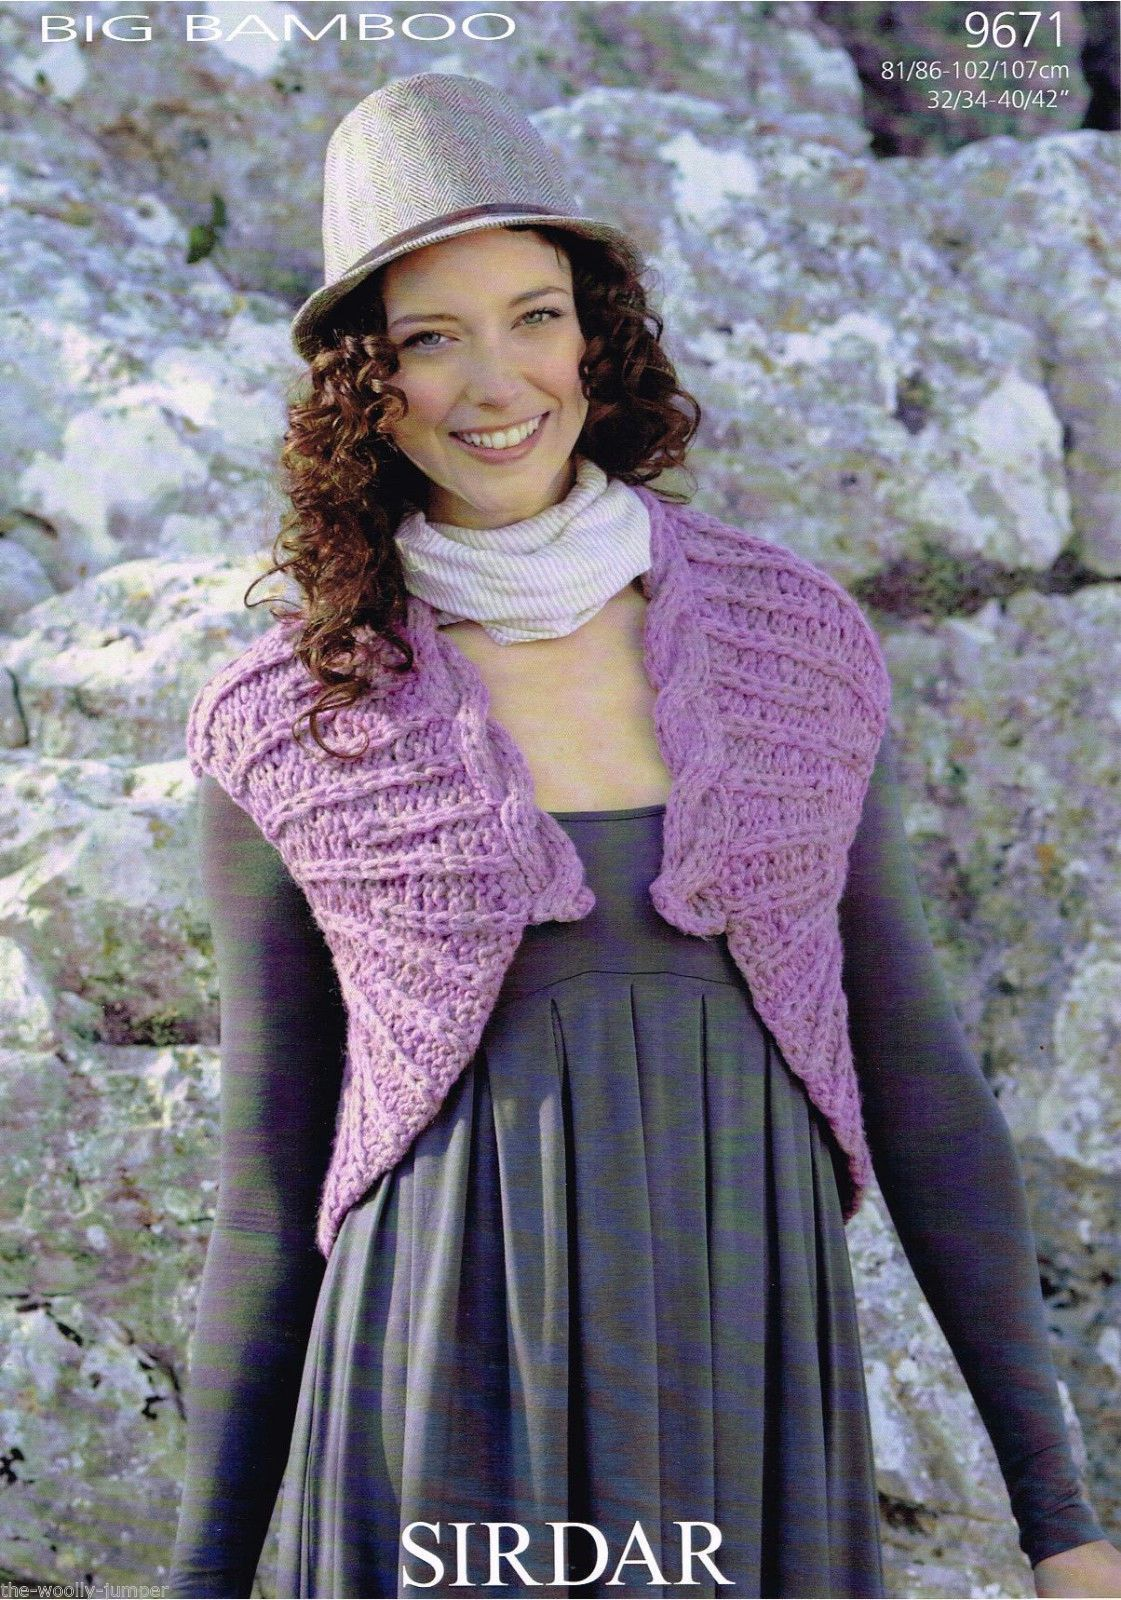 9671 Sirdar Big Bamboo Super Chunky Bolero Waistcoat Knitting